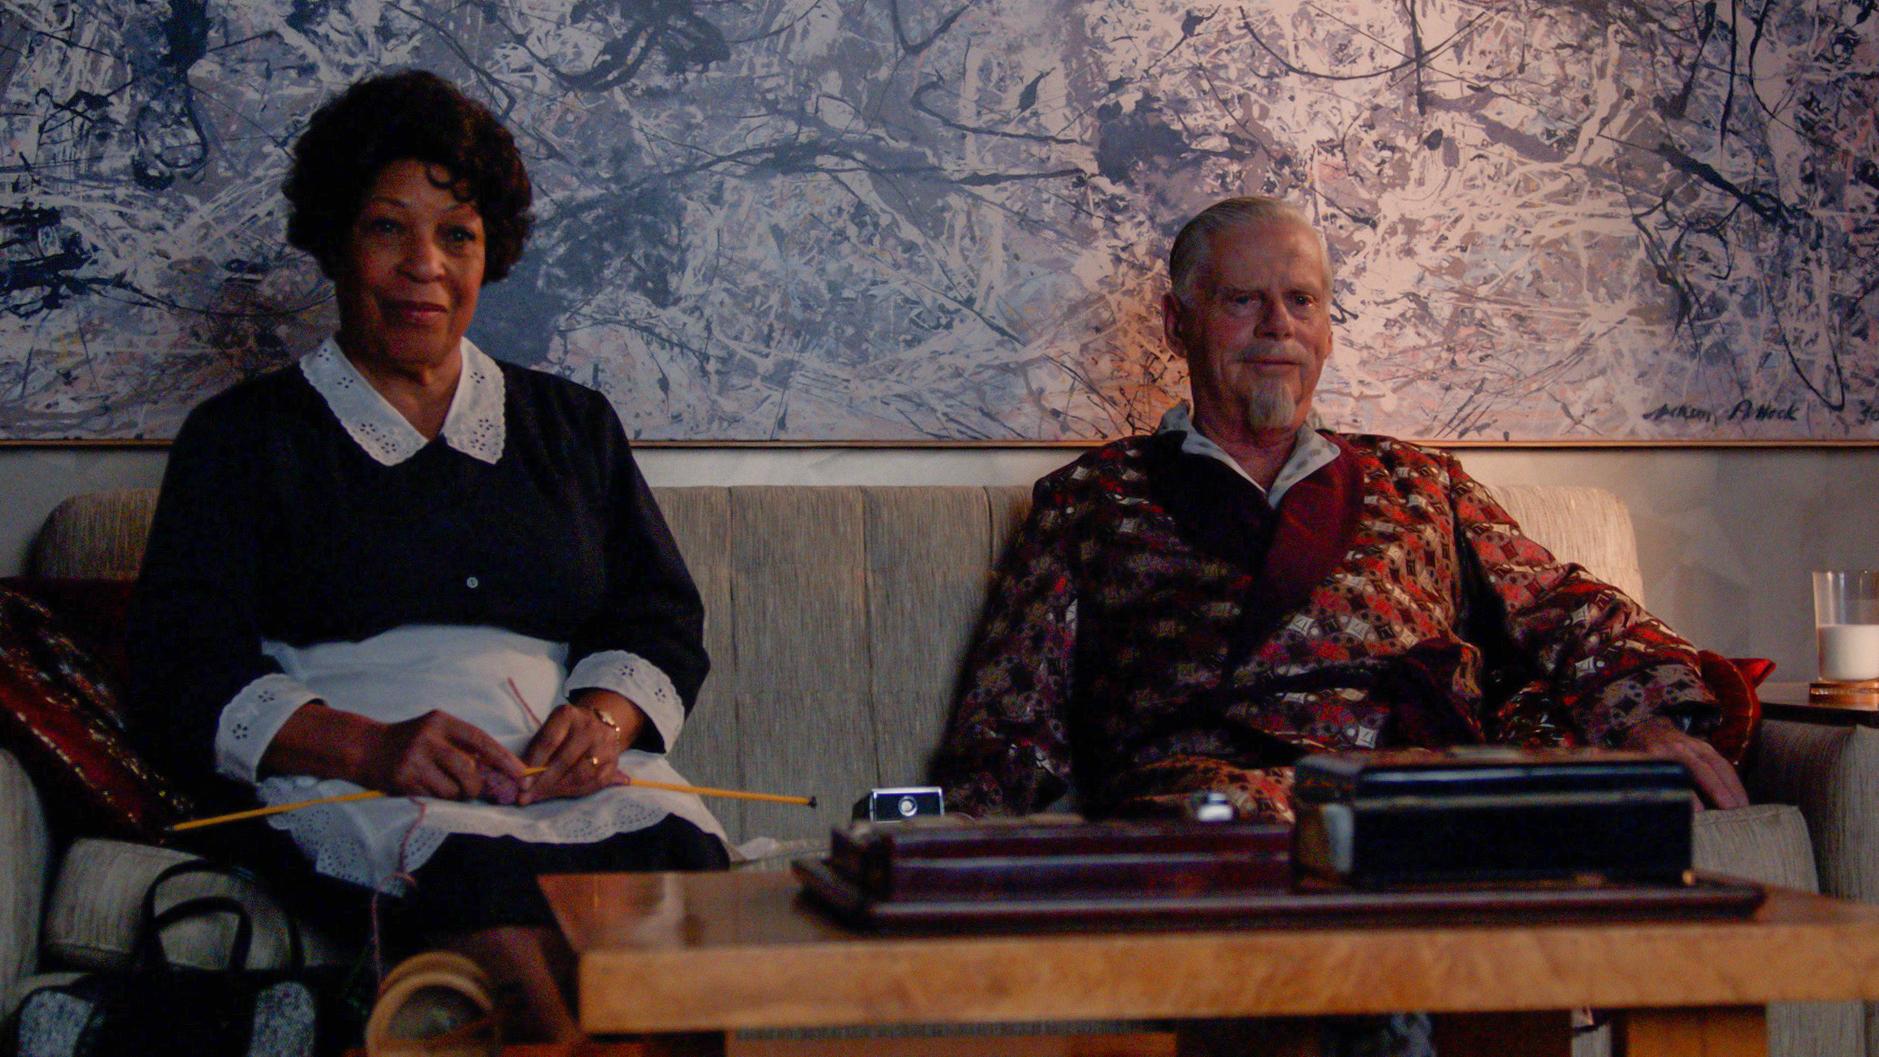 Robert Morse as Bertram Cooper - Mad Men _ Season 7, Episode 7 - Photo Credit: Courtesy of AMC